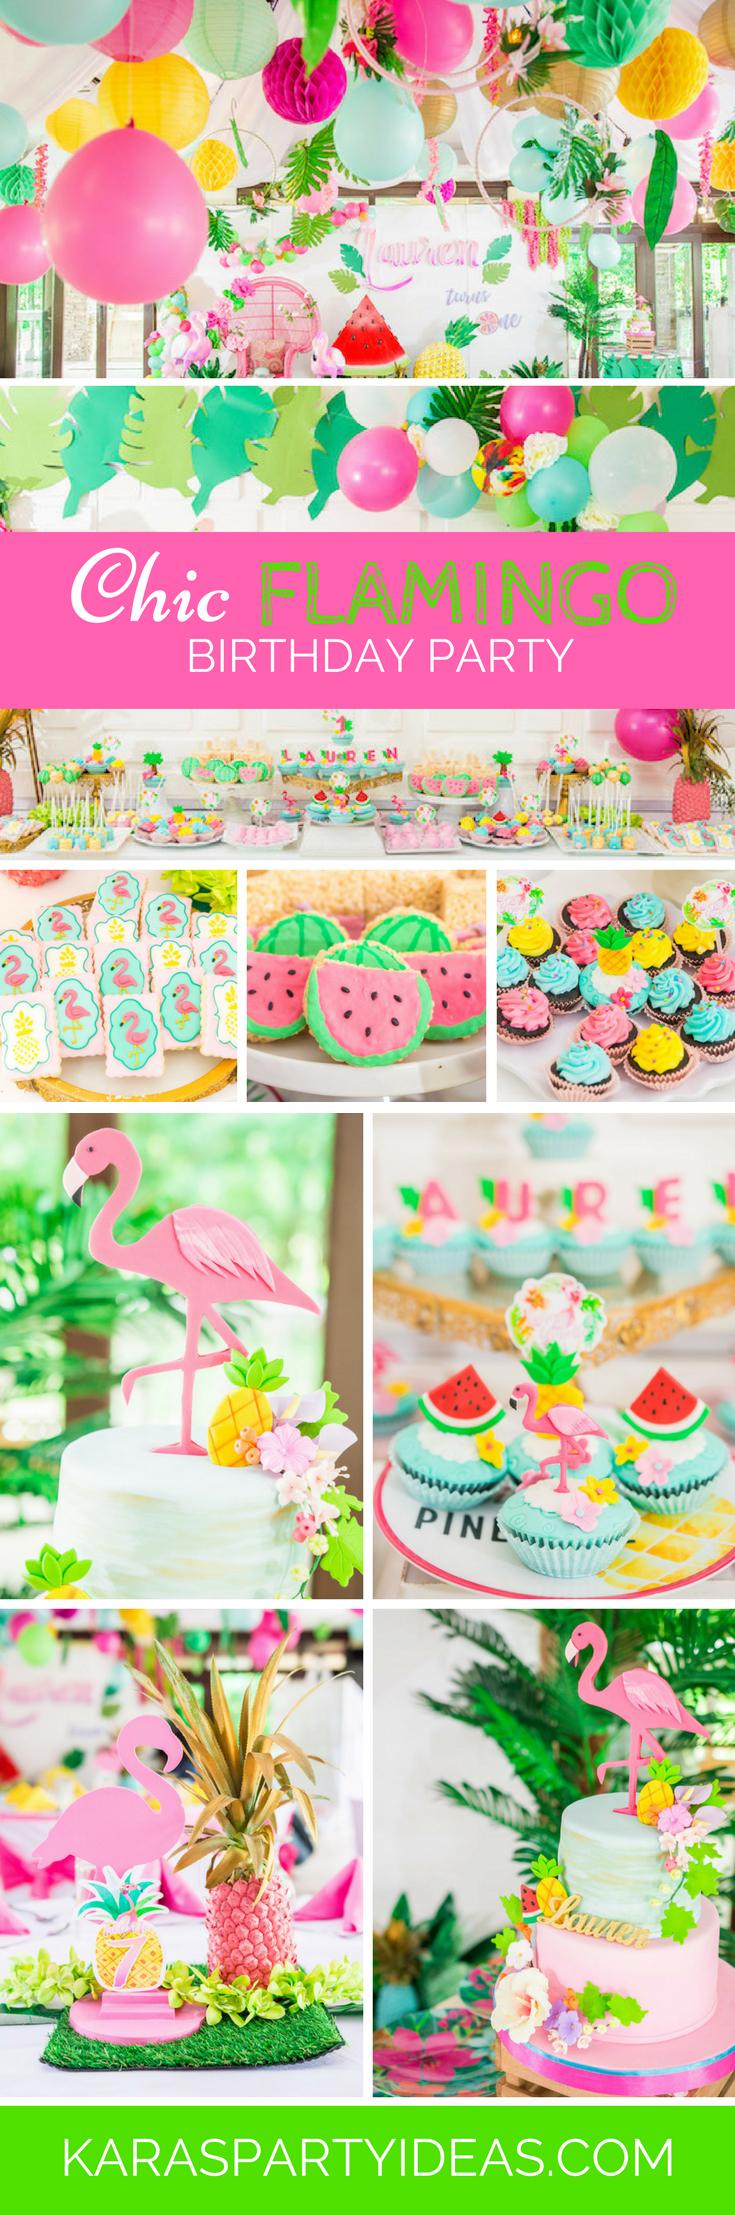 Tea time tea birthday party via kara s party ideas karaspartyideas com - Chic Flamingo Birthday Party Via Kara S Party Ideas Karaspartyideas Com